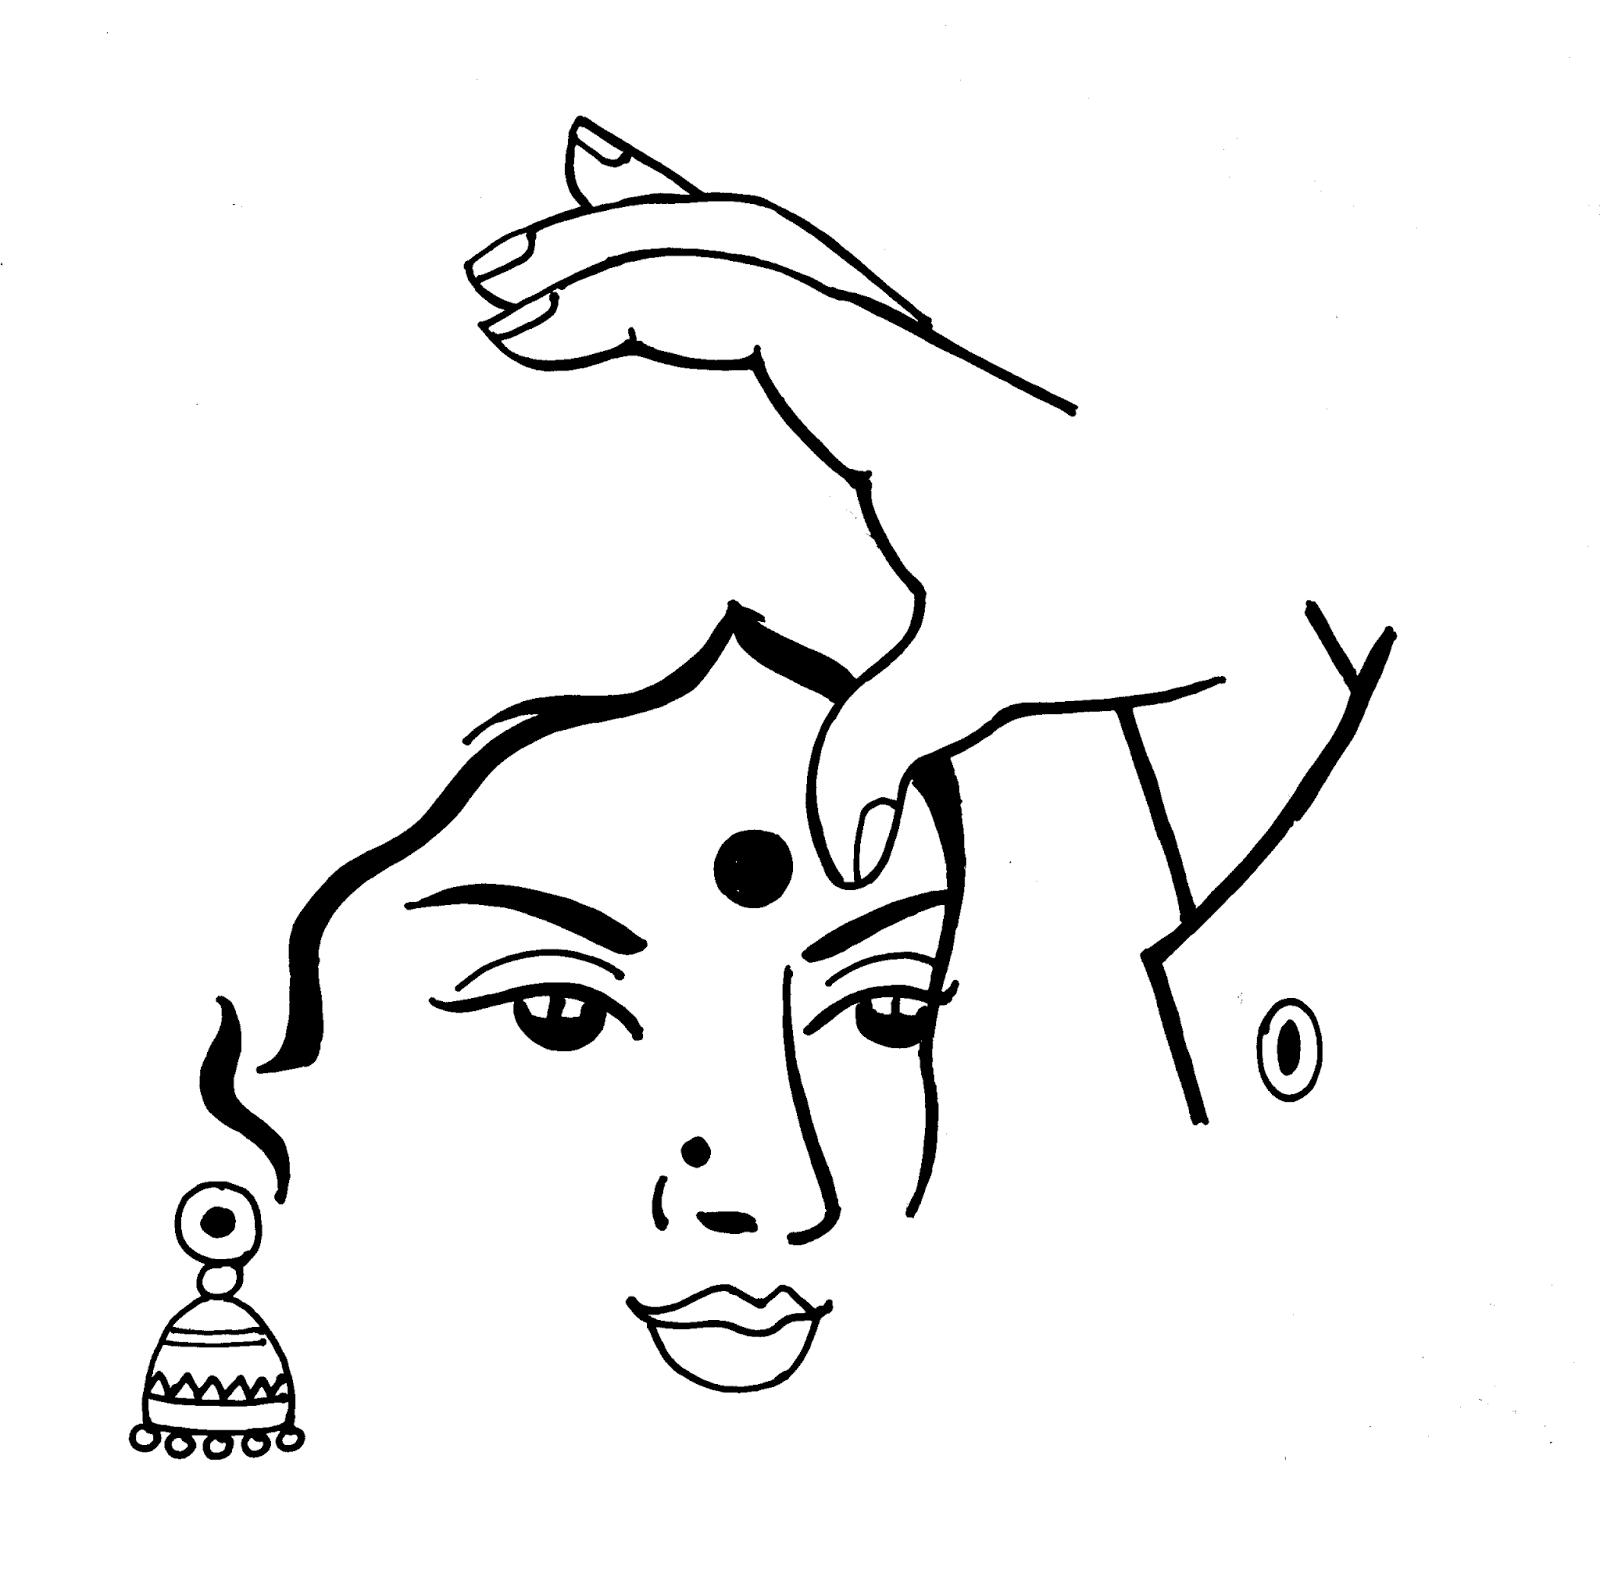 Line Art Wedding : Tamil cliparts printing line art wedding and